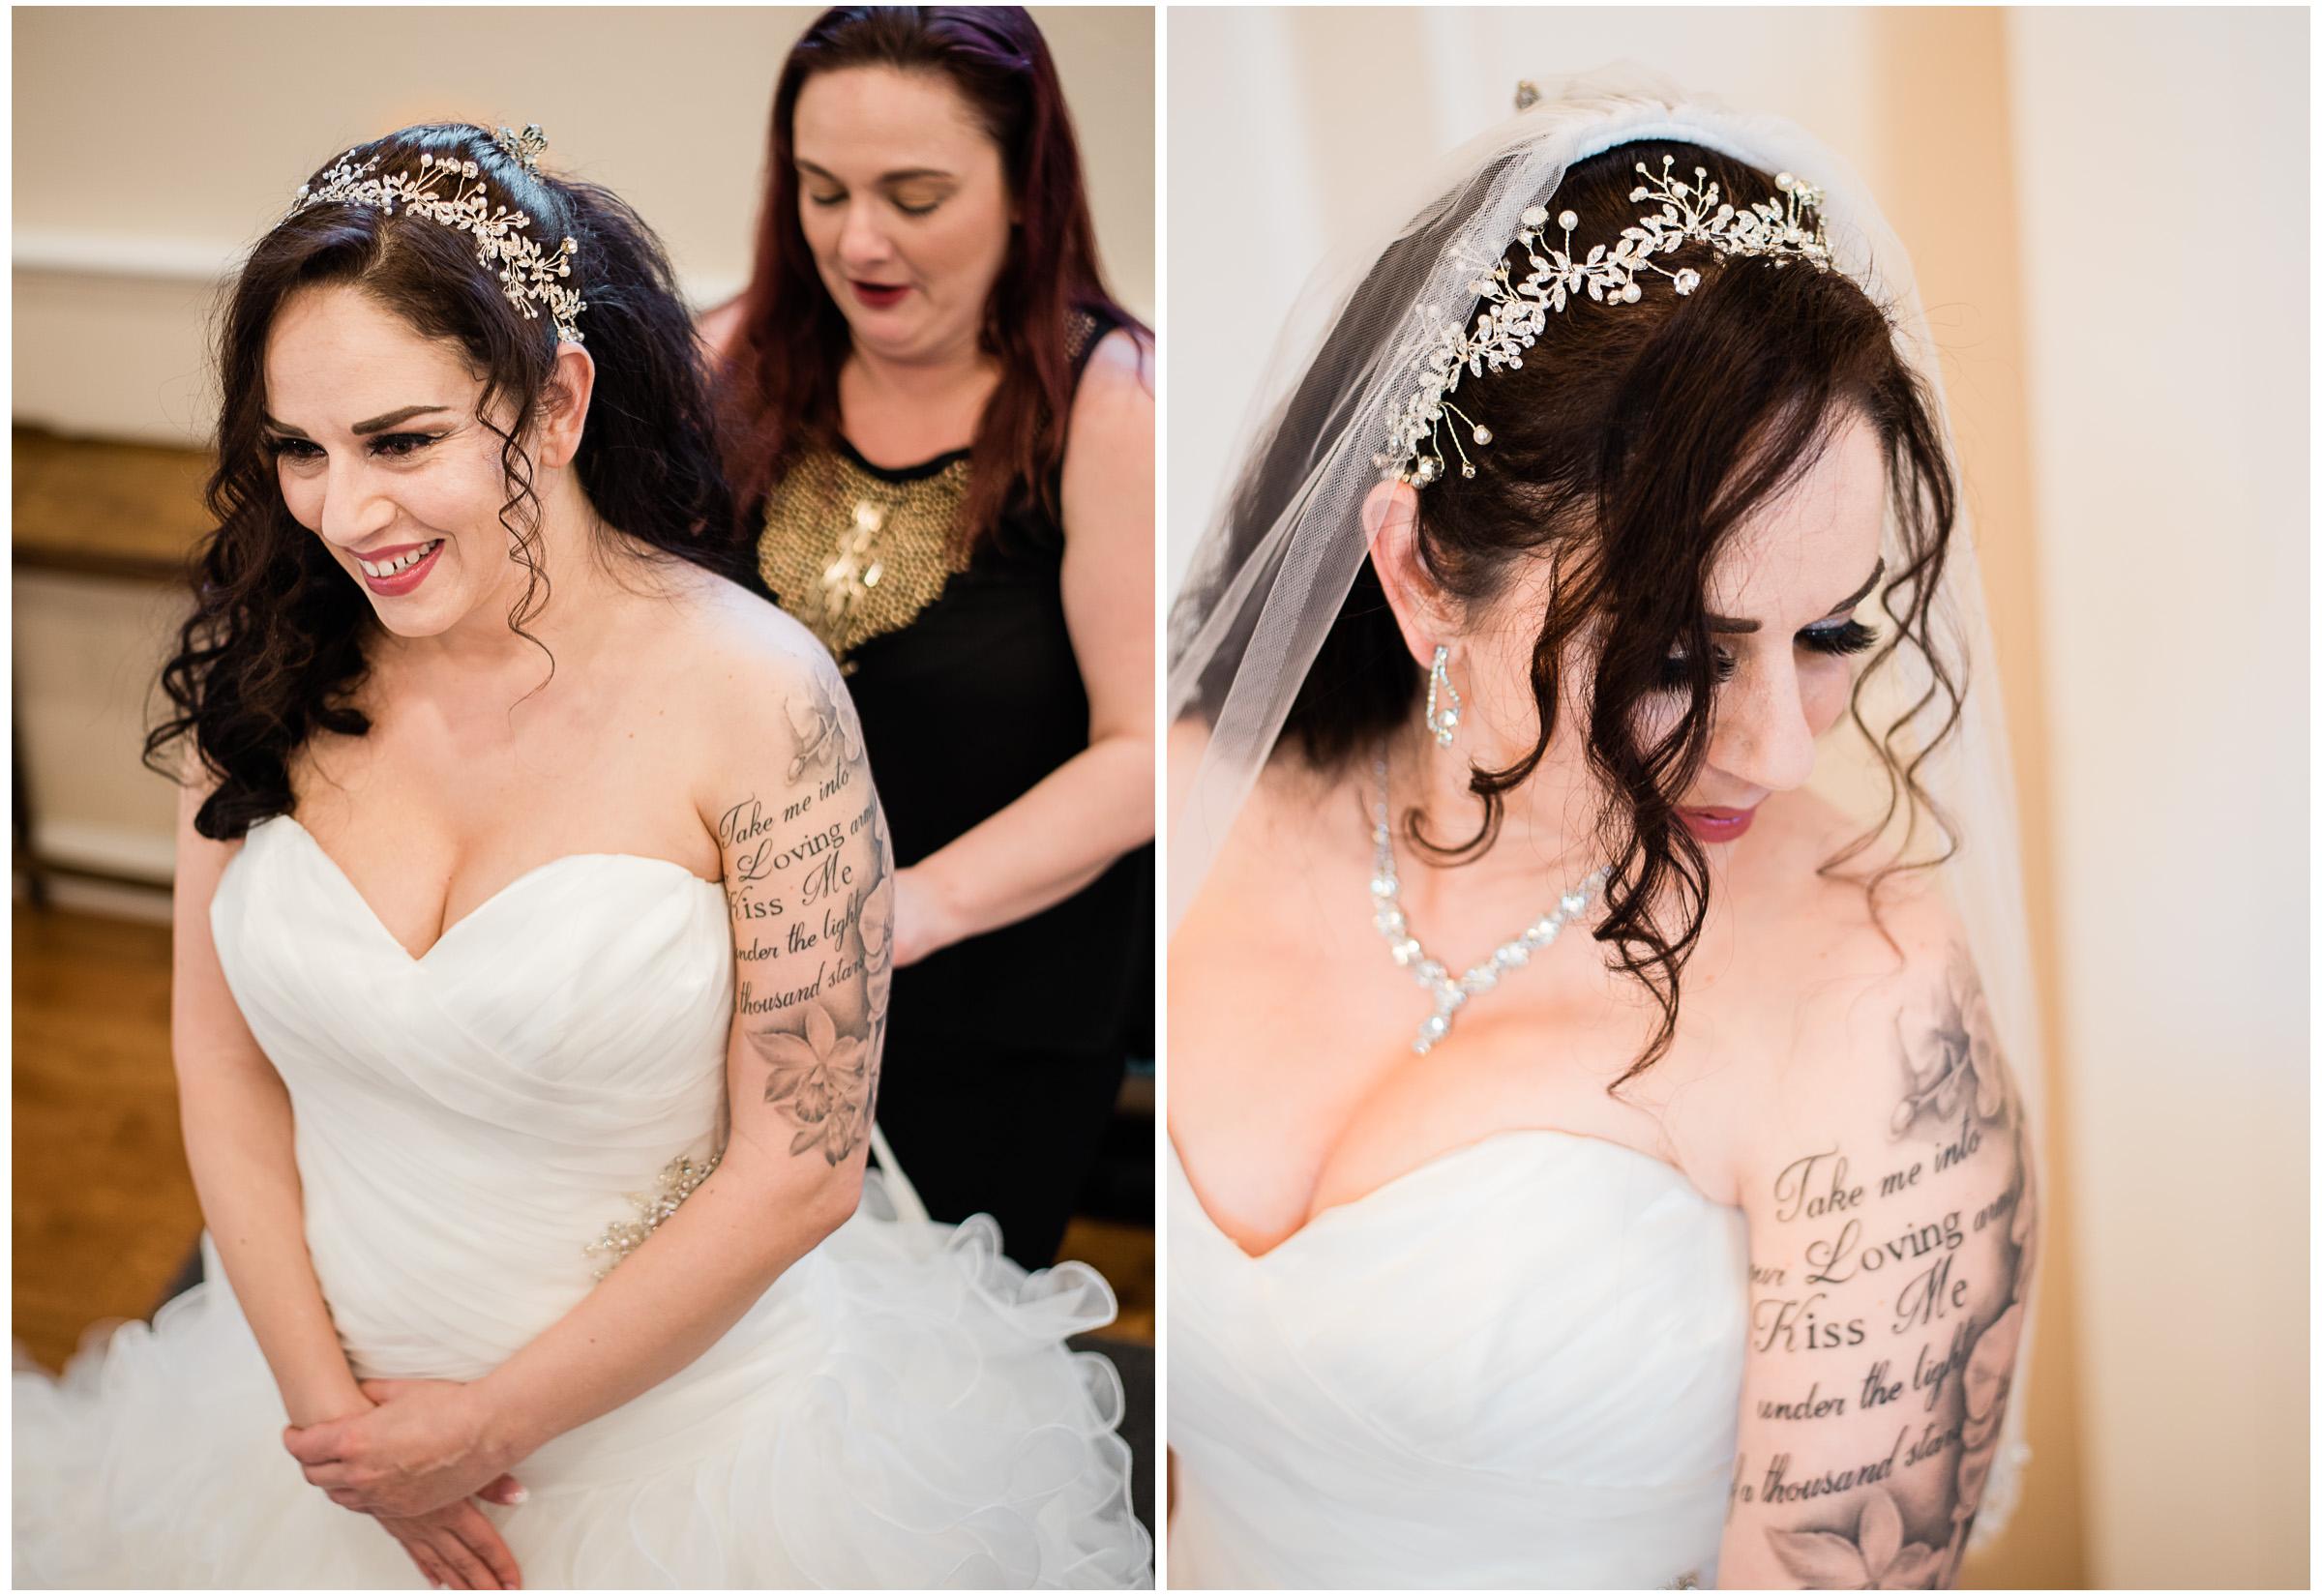 Sacramento Wedding - Sacramento Photographer - Justin Wilcox Photography - 10.jpg